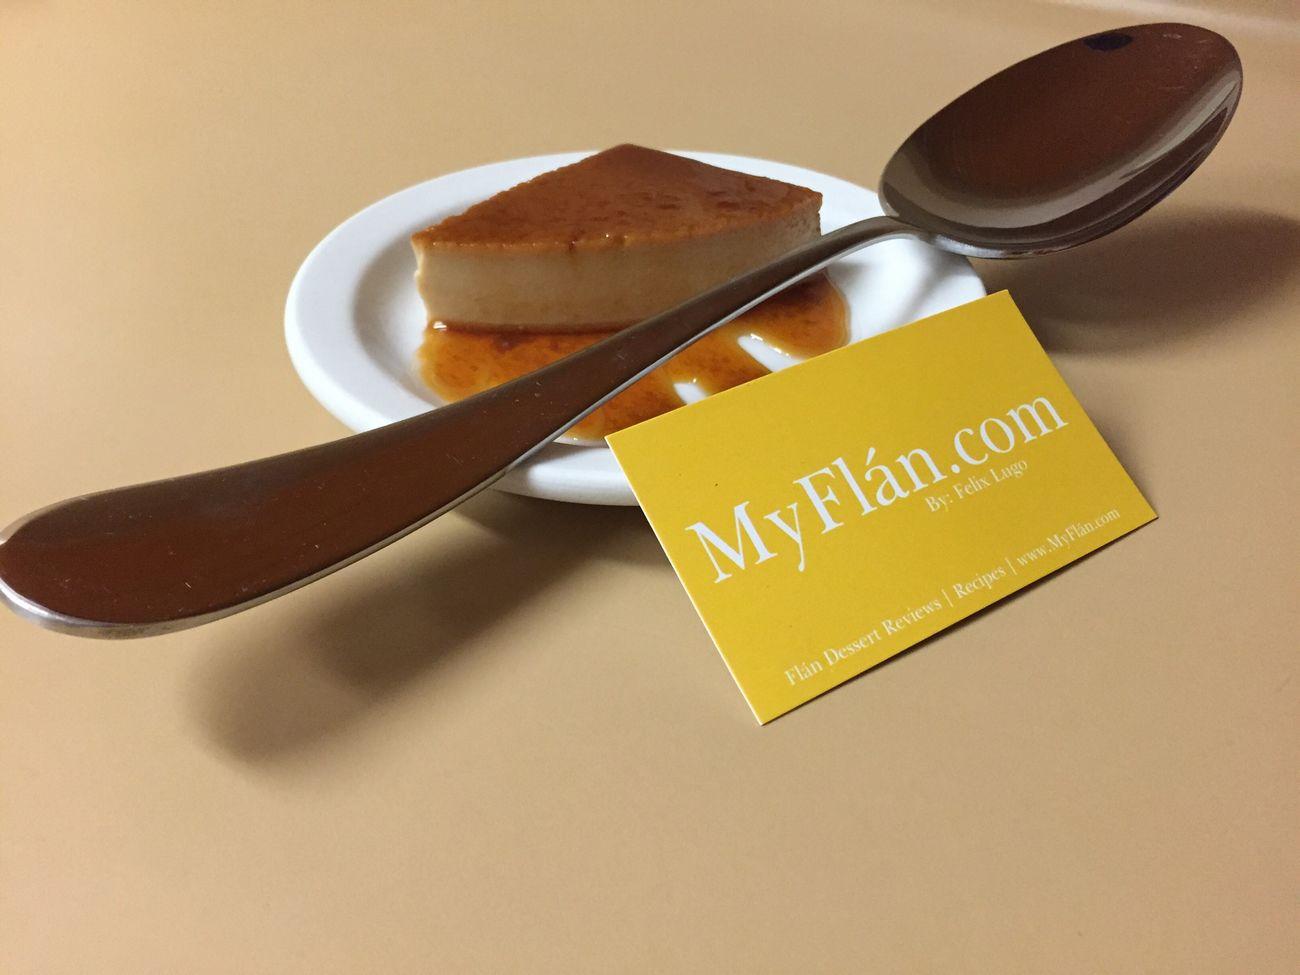 Spoon Pastry Flan Cake Foodporn Food Dessert Desserts Myflan Pudim